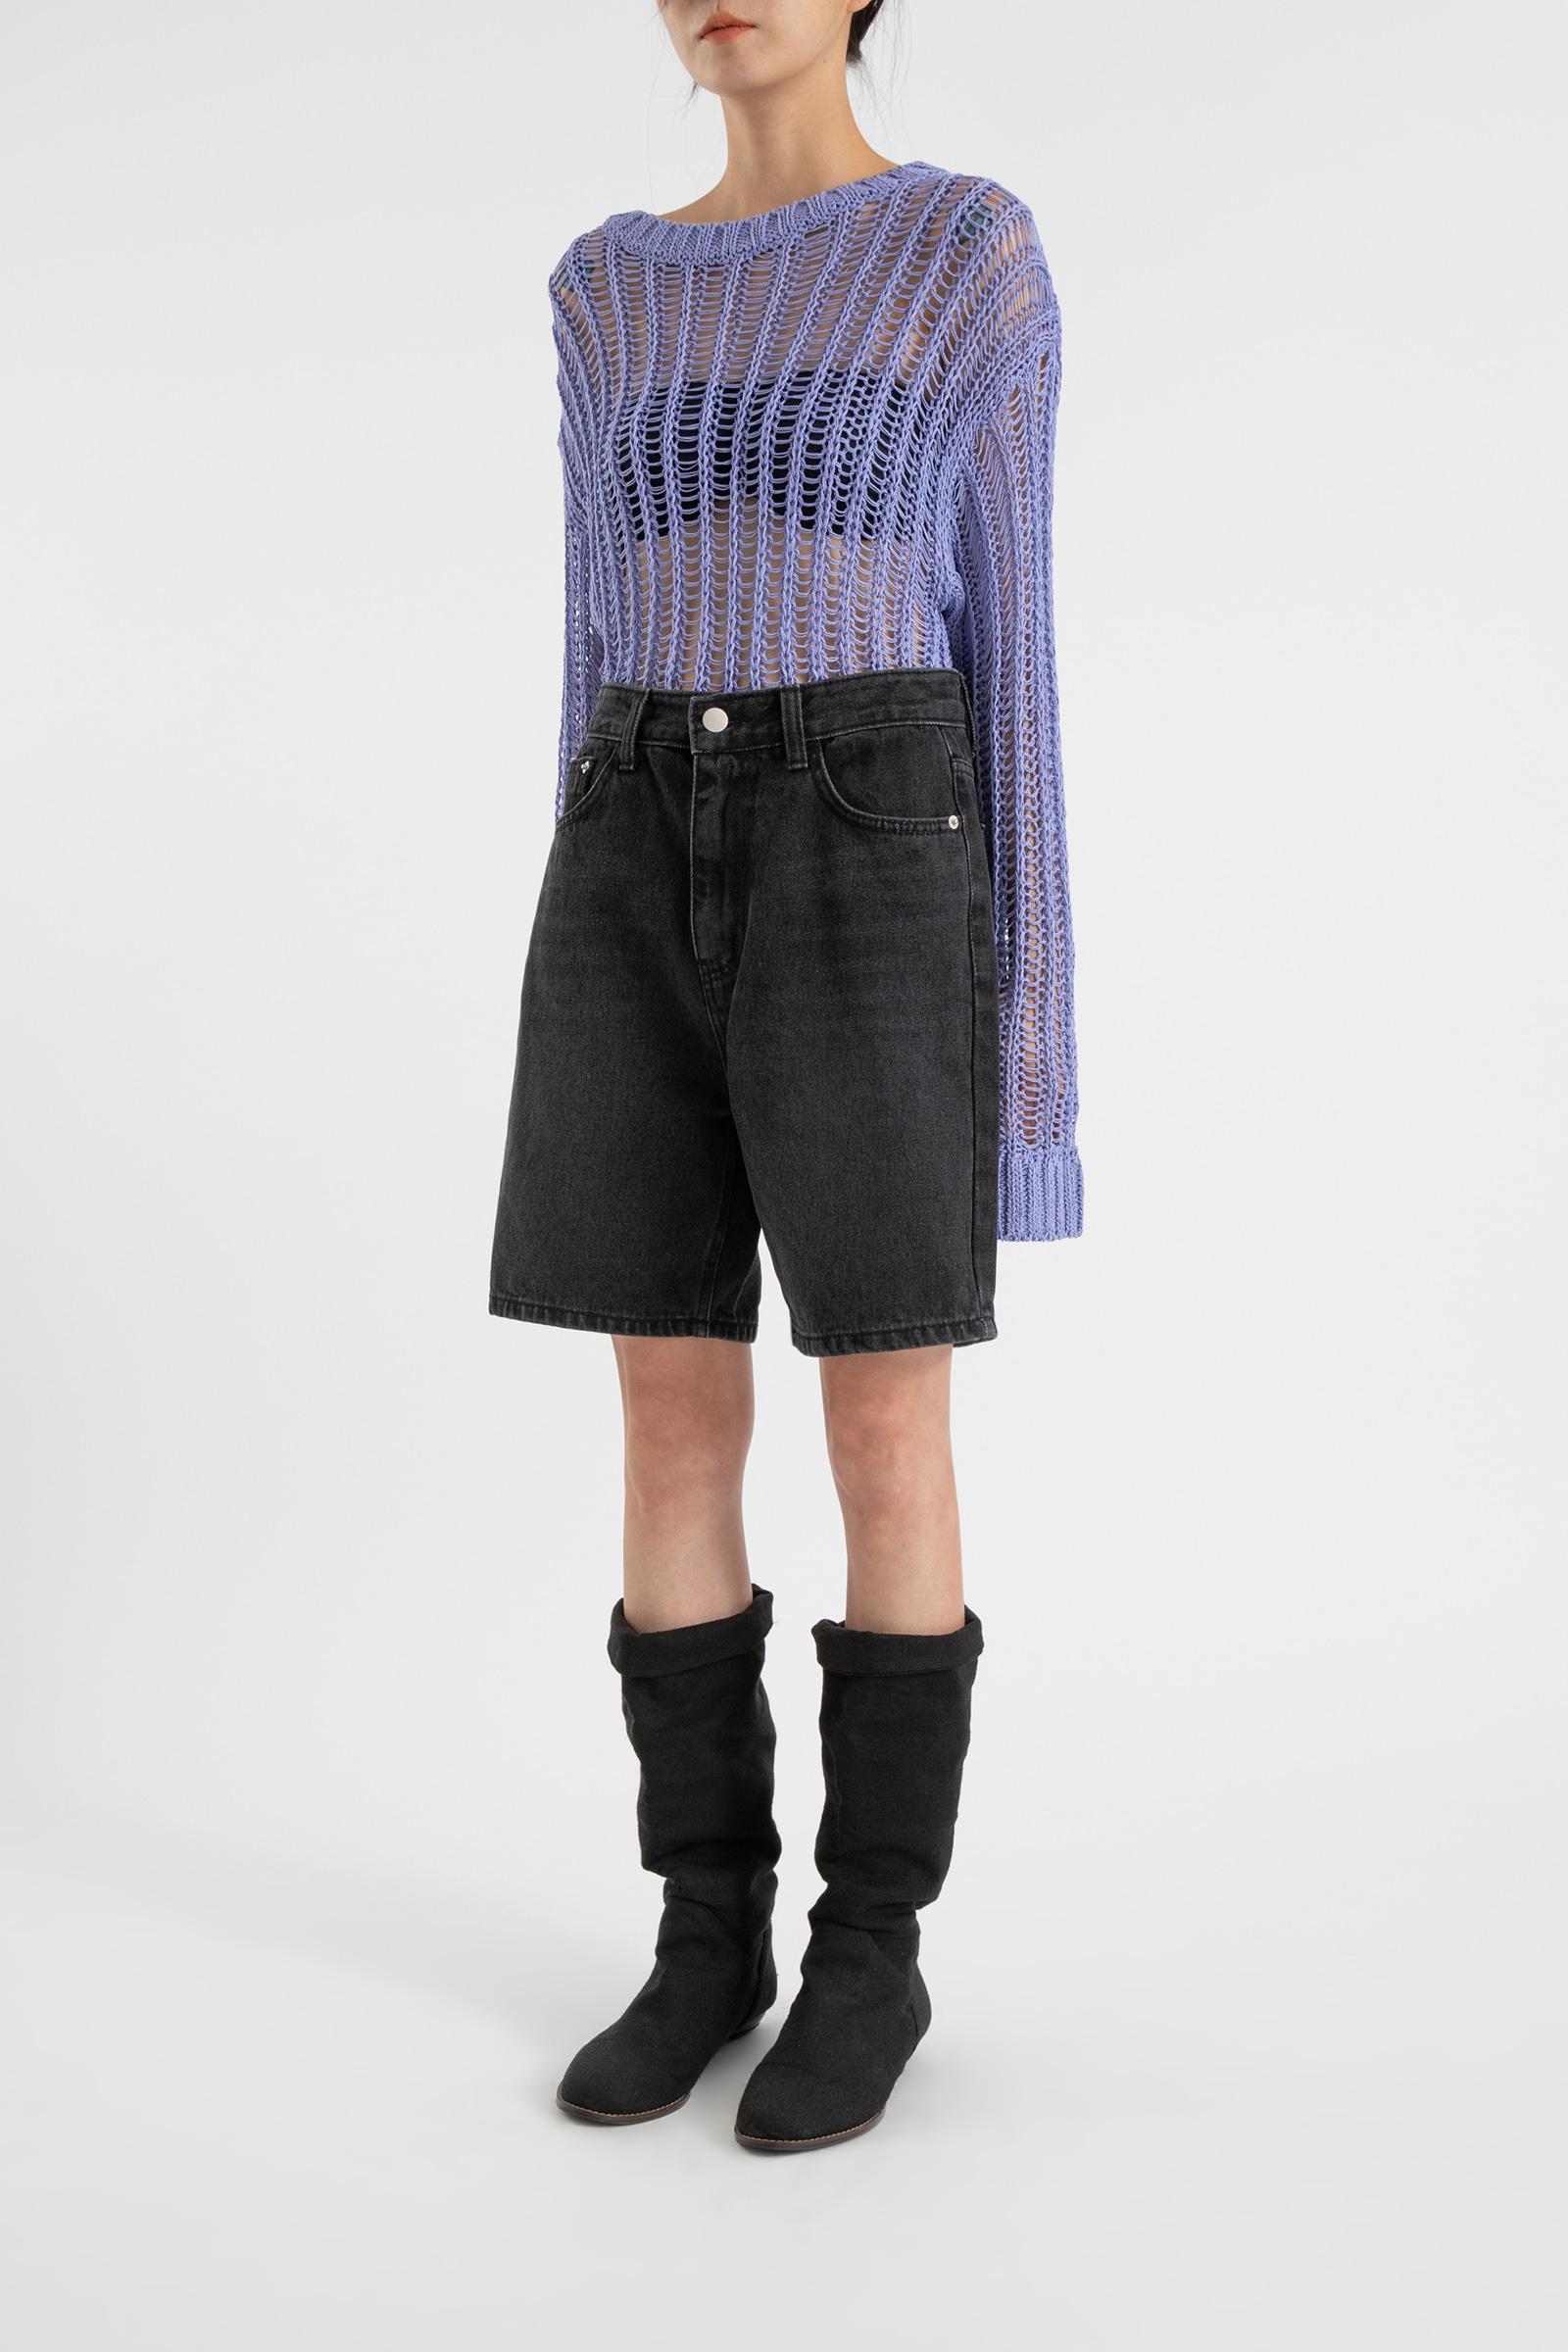 Vibe high-rise half jeans